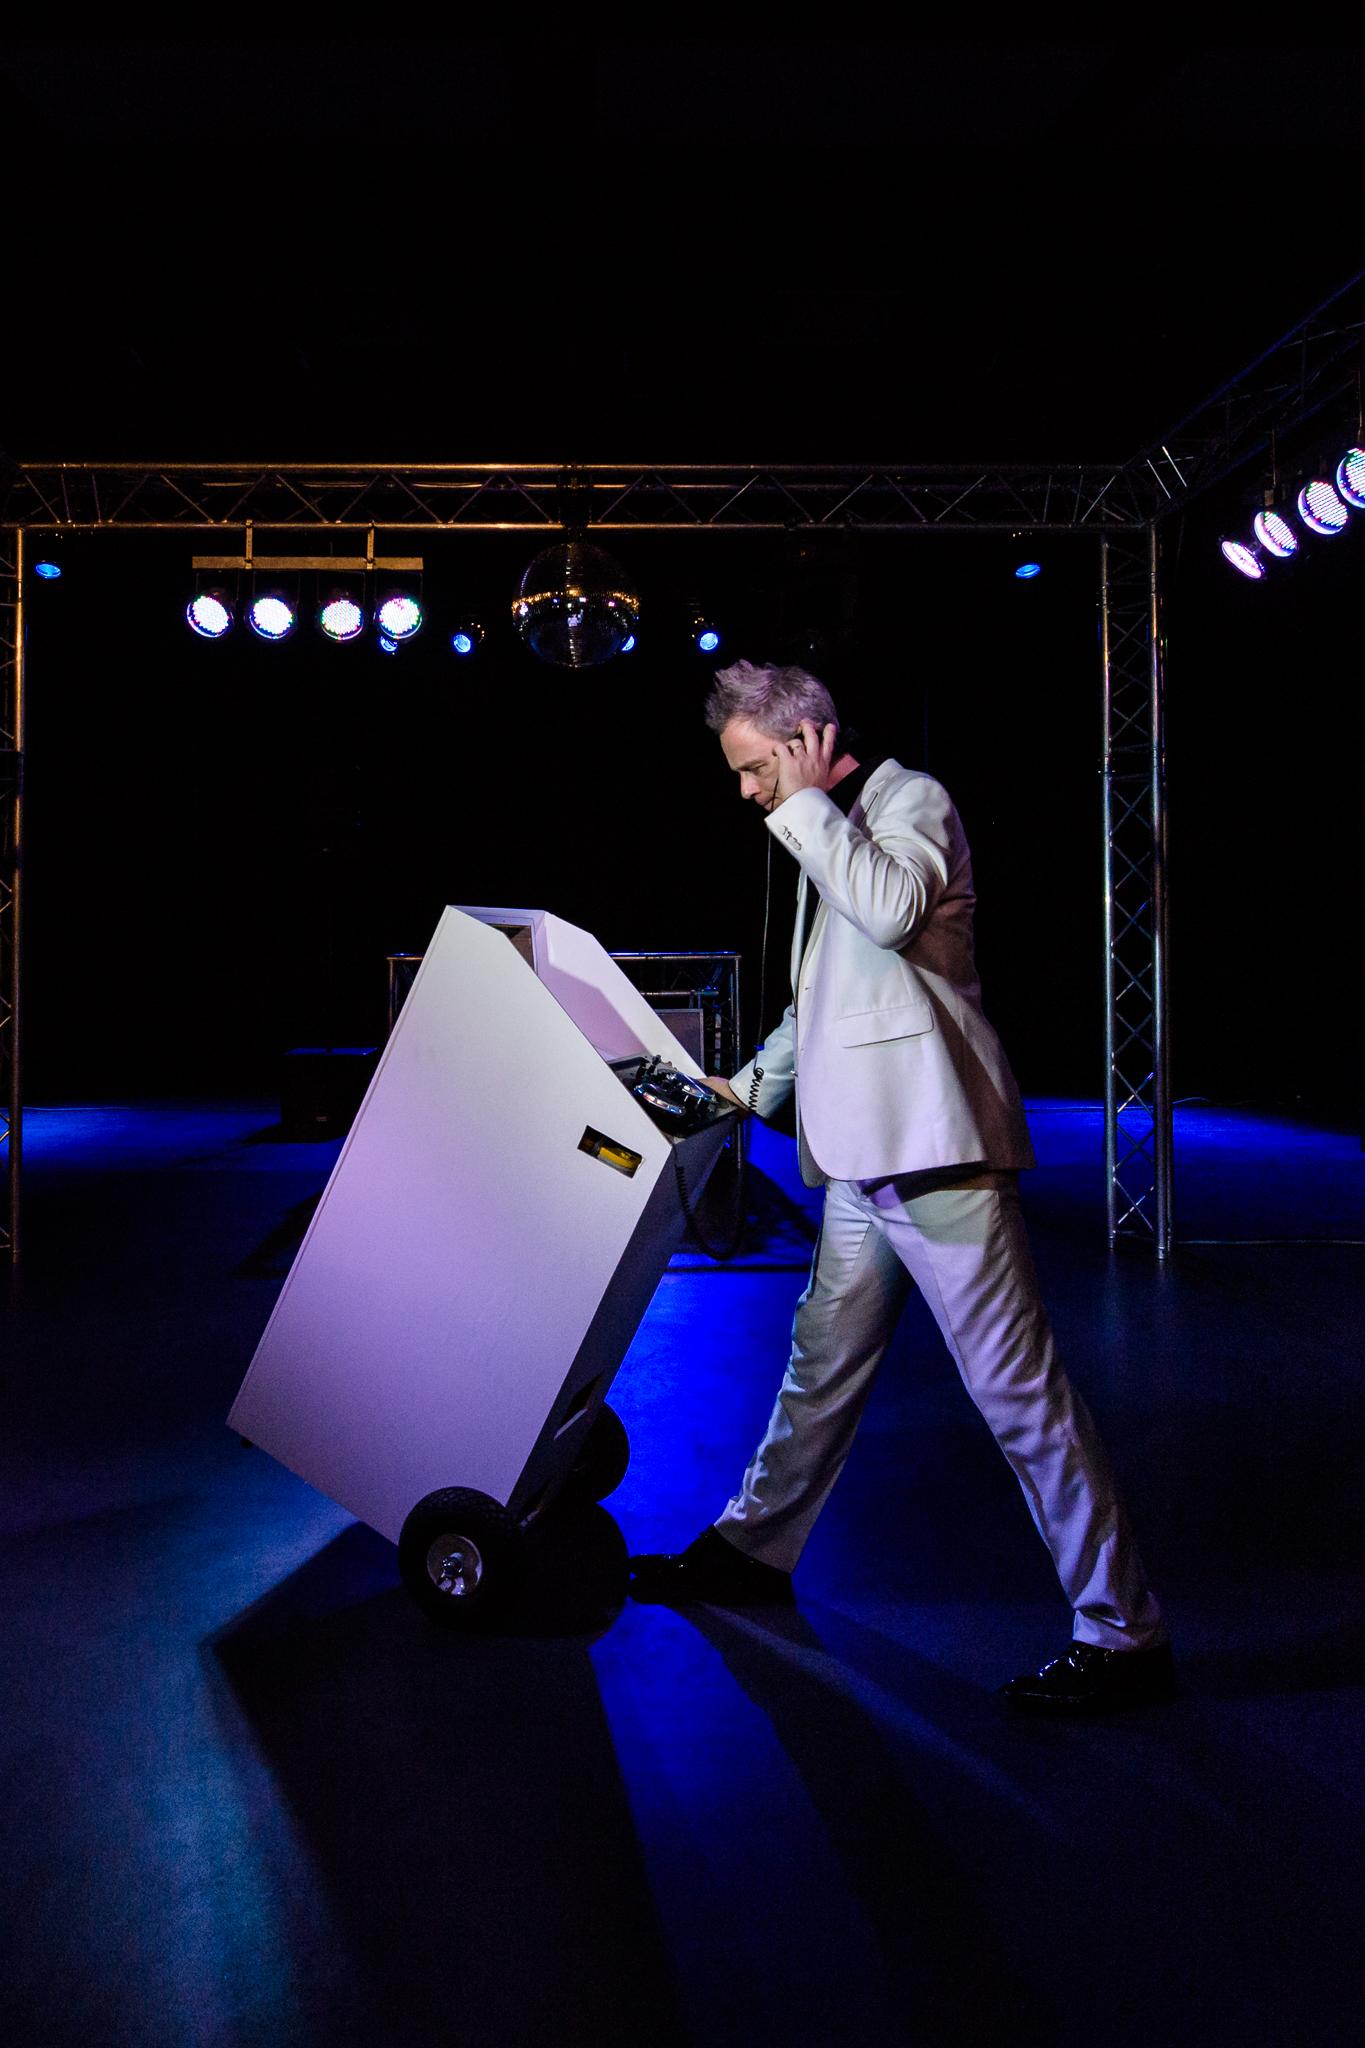 walking DJ in theater